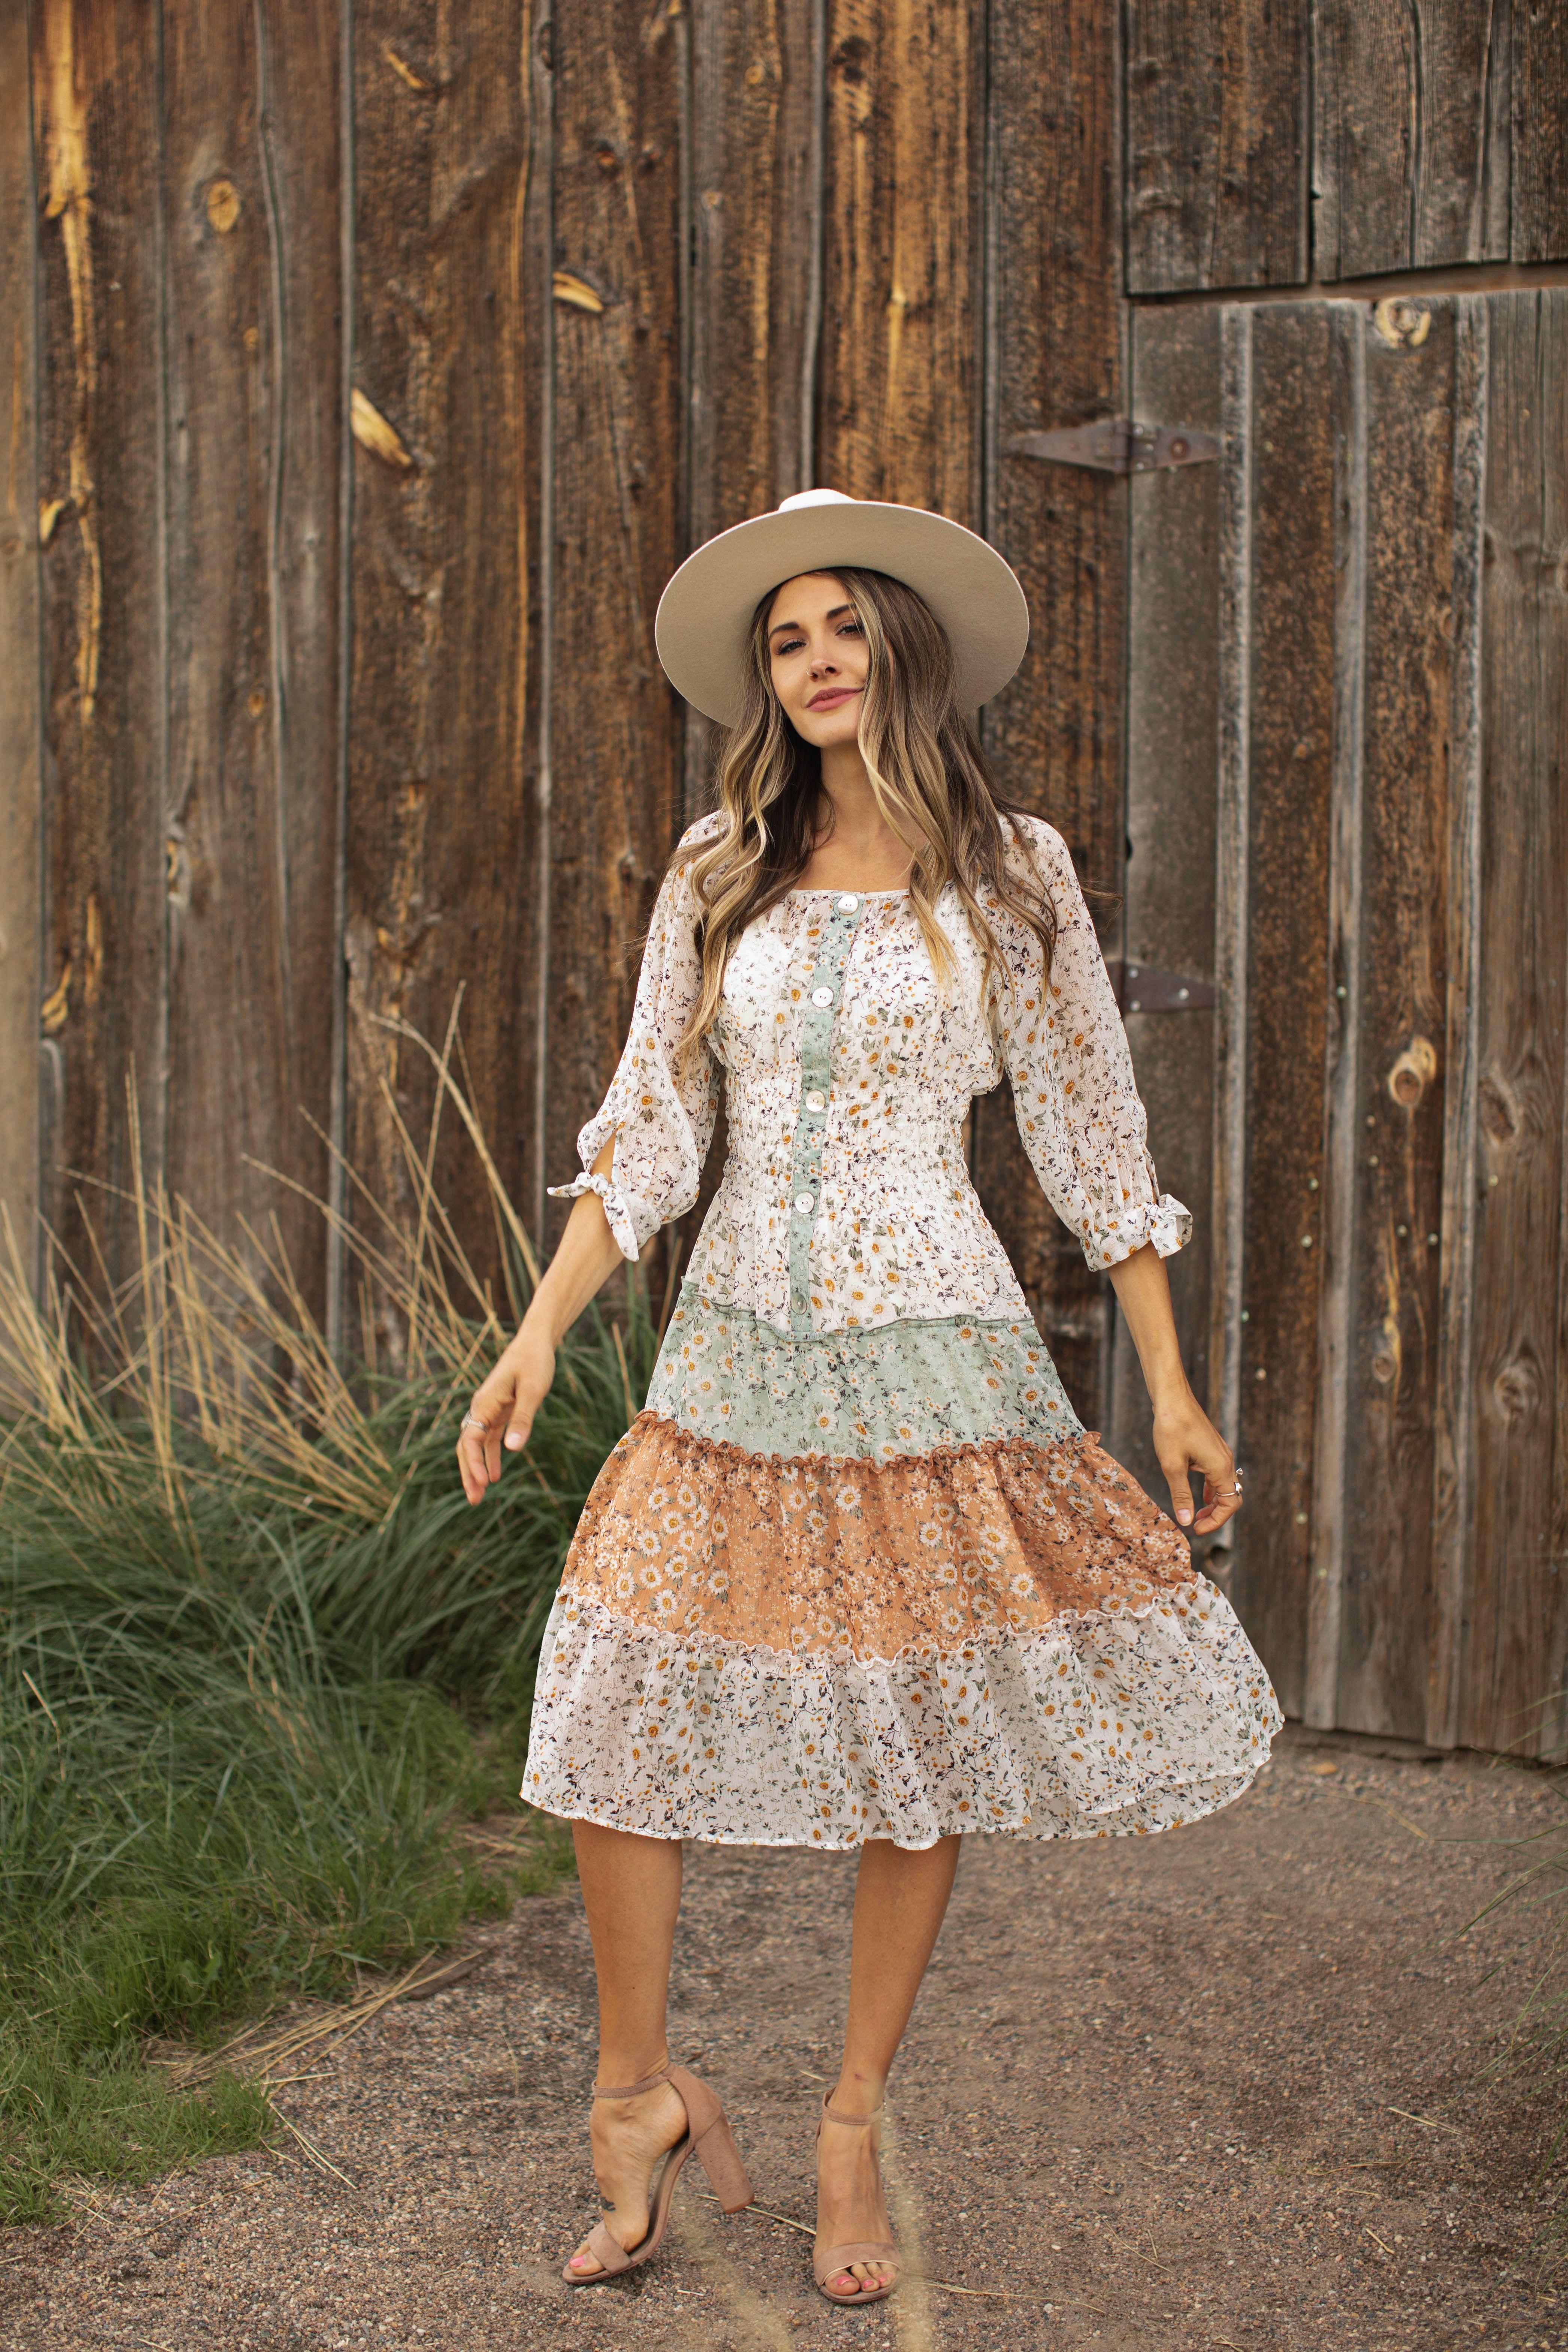 Alexa Mixed Ditsy Peasant Dress -Olive/Brown - Front